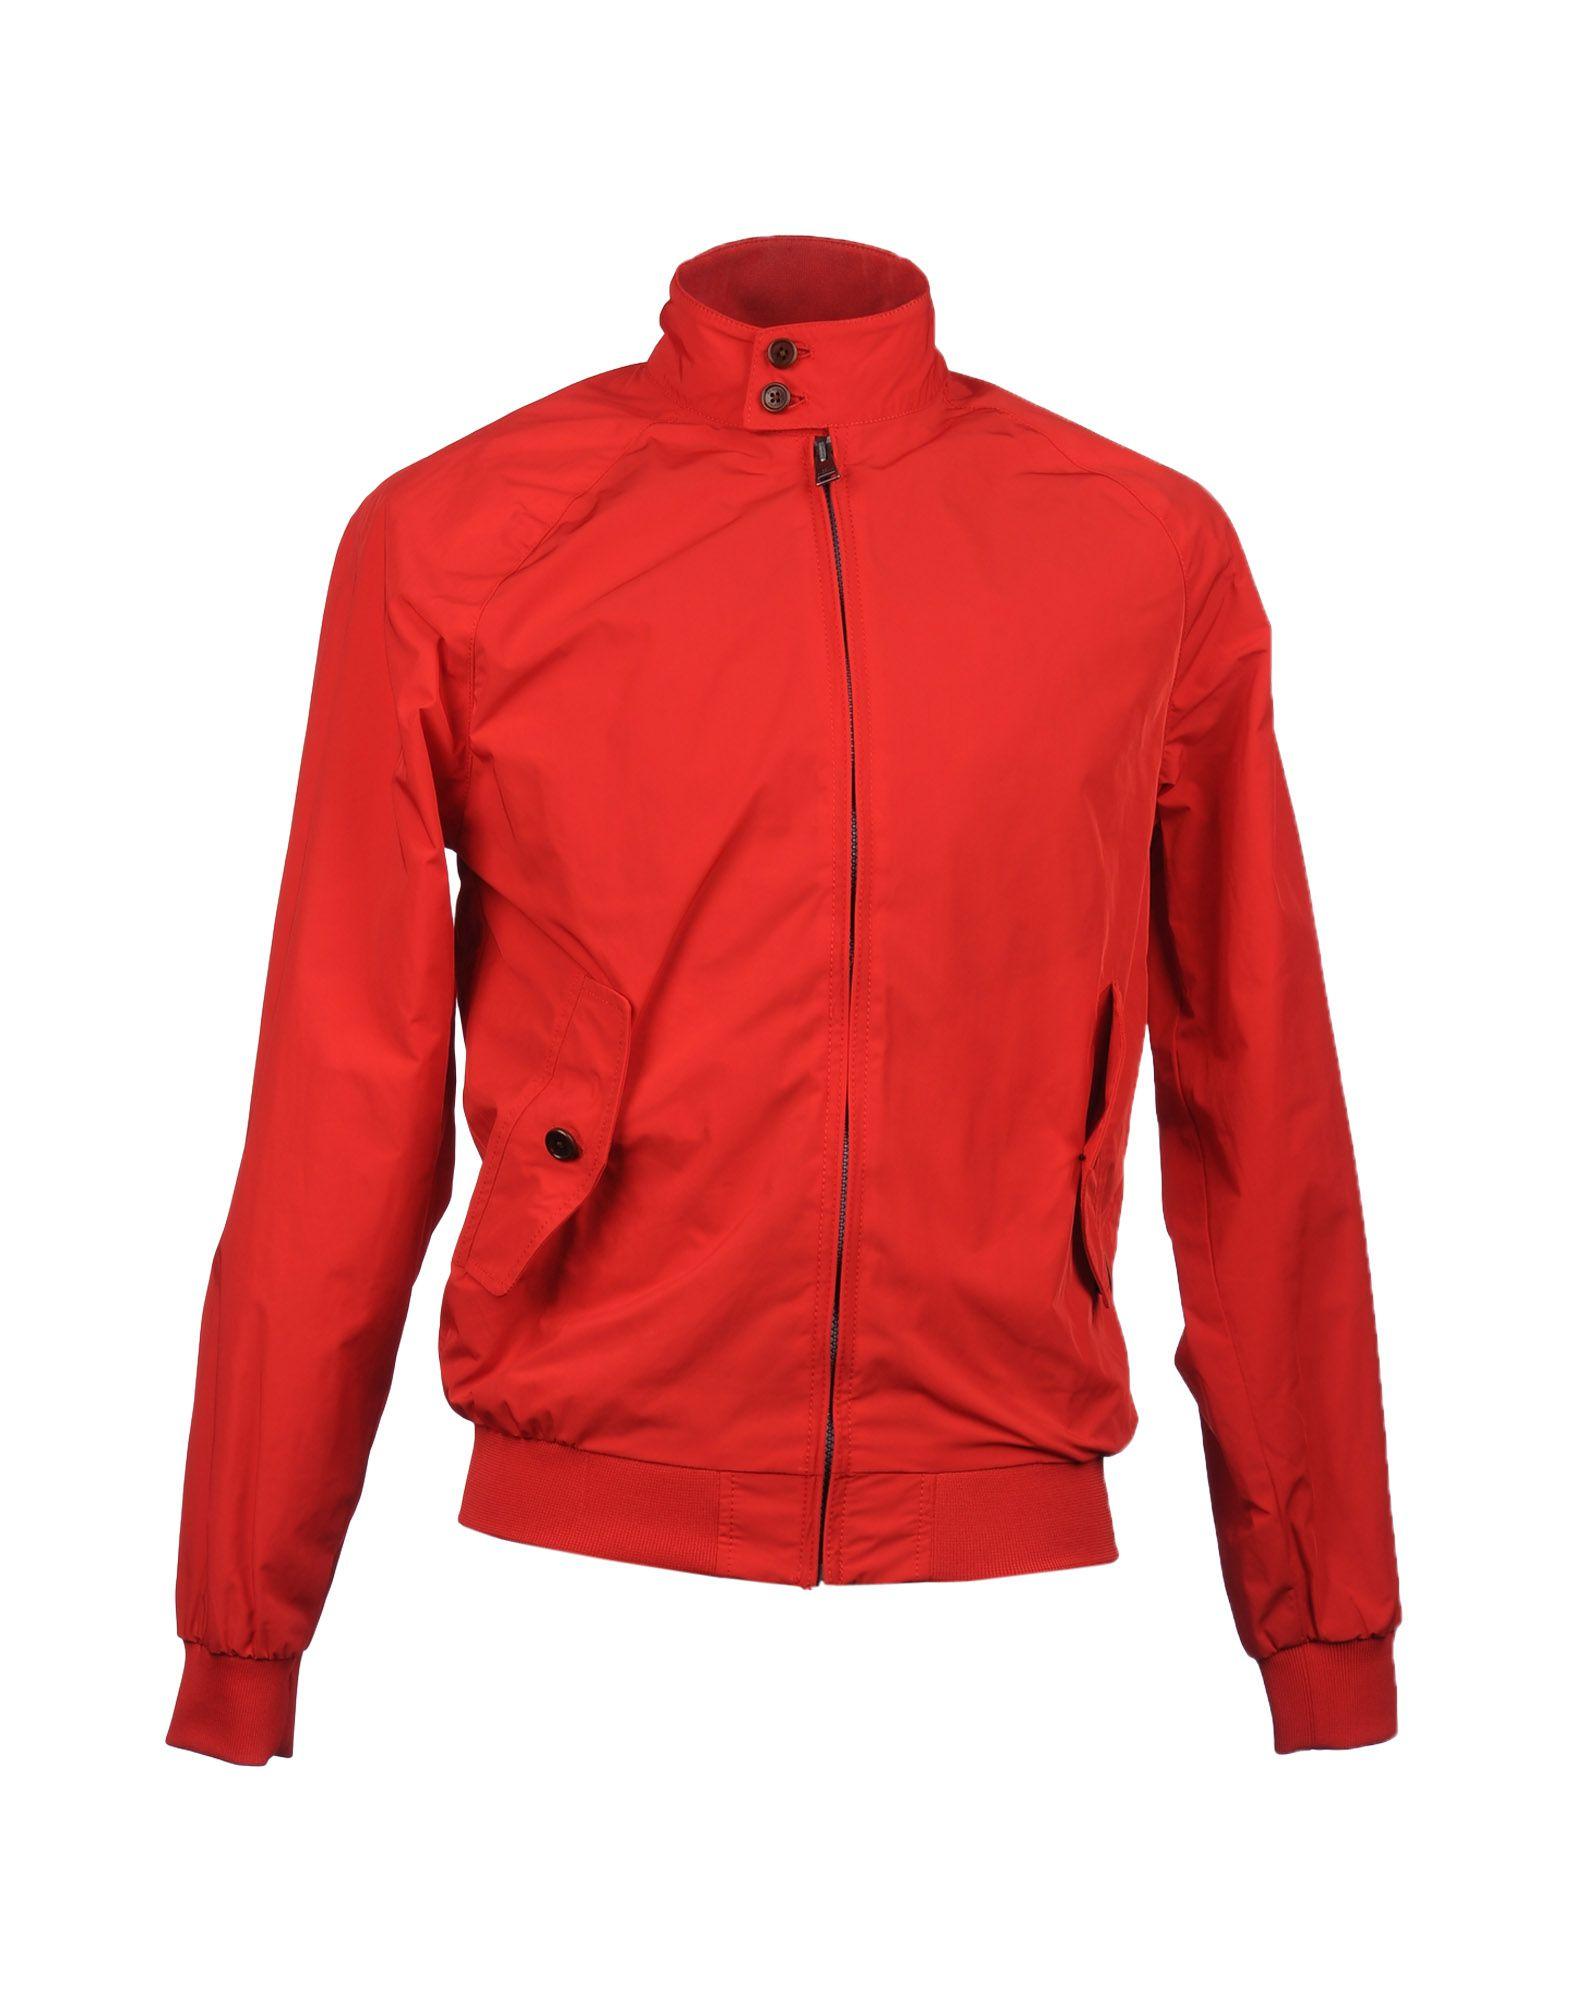 Ben sherman womens jacket